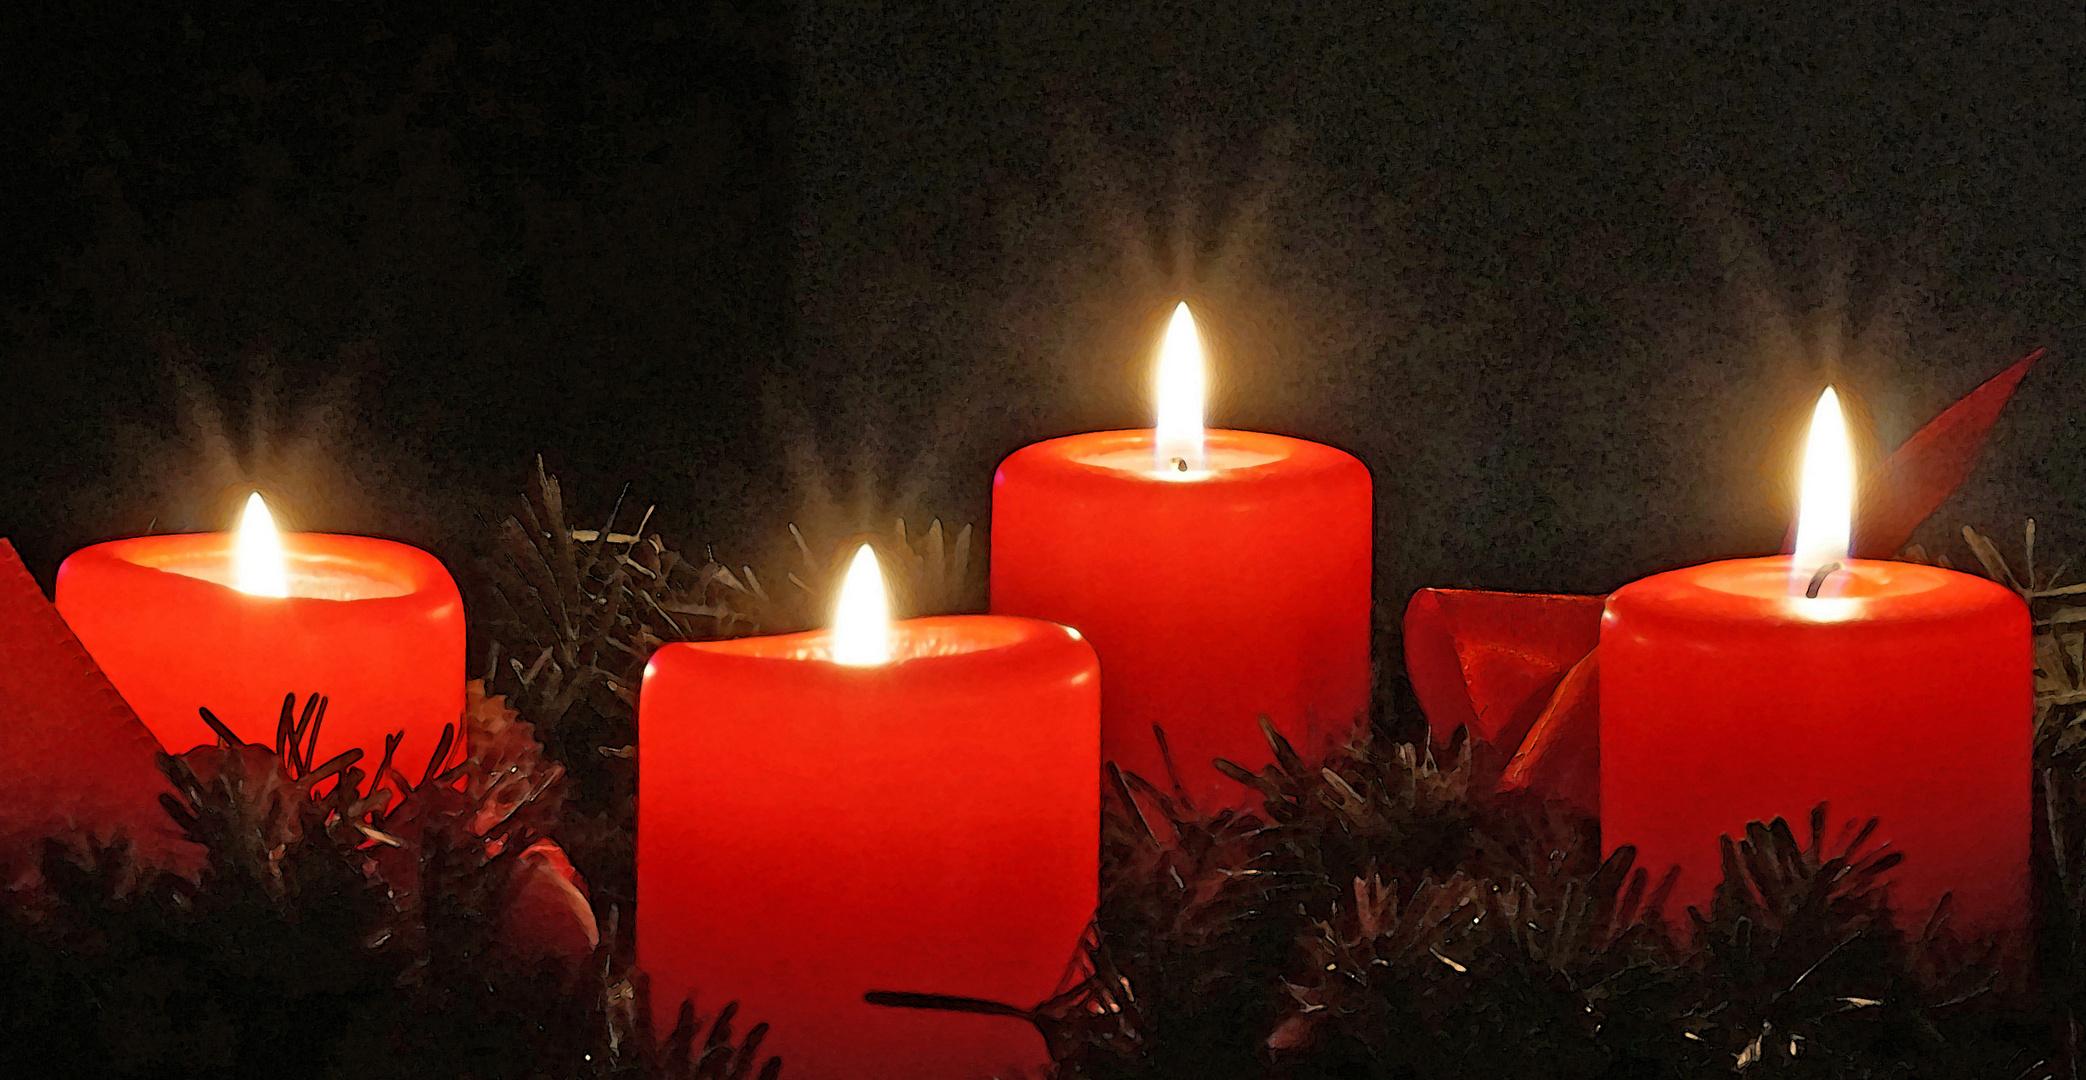 Vier Kerzen brennen schon ...